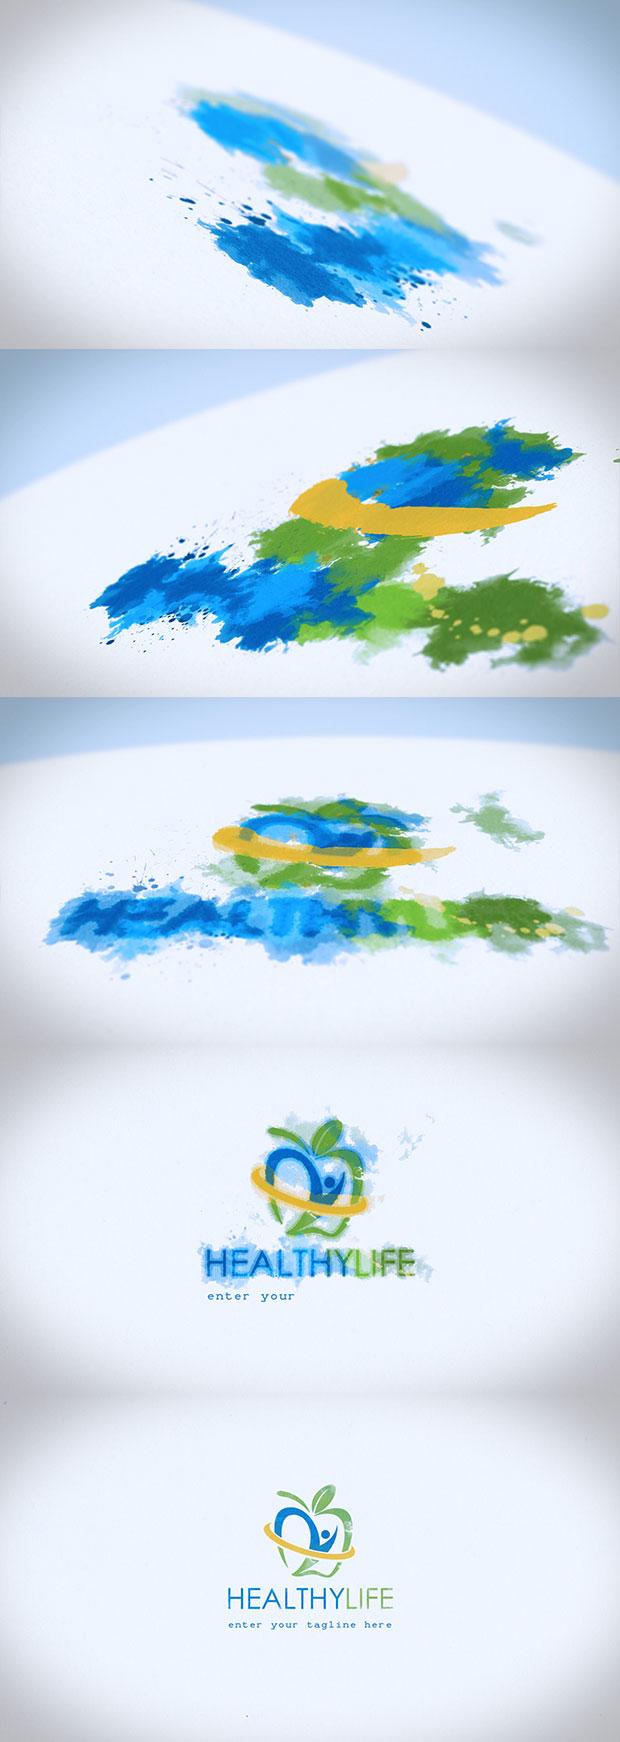 Watercolor & Ink Logo Reveal - 2